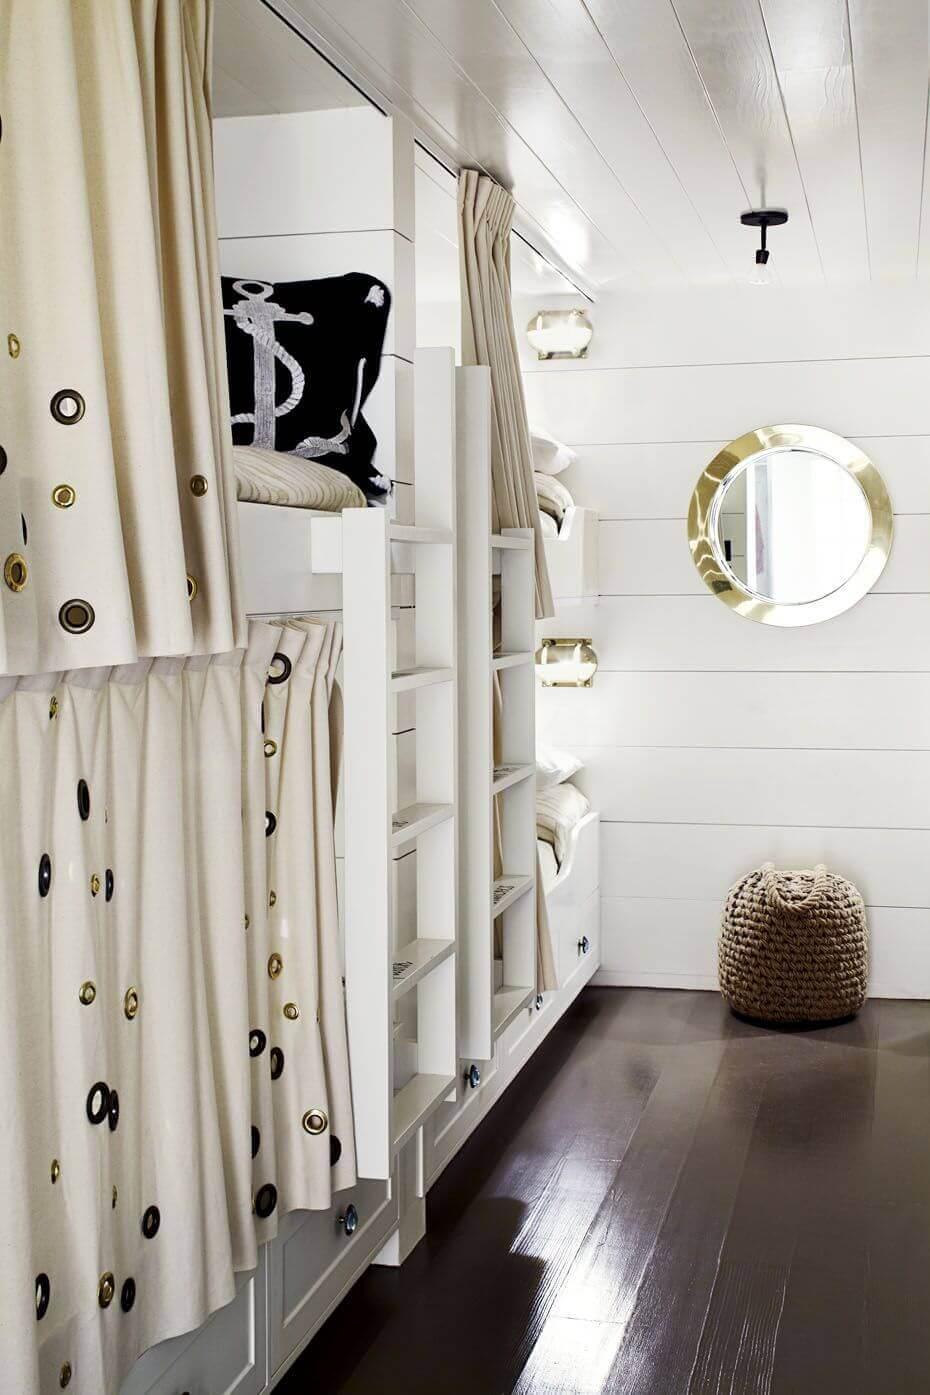 Teenage Bedroom Ideas 2020 Stick to a Theme